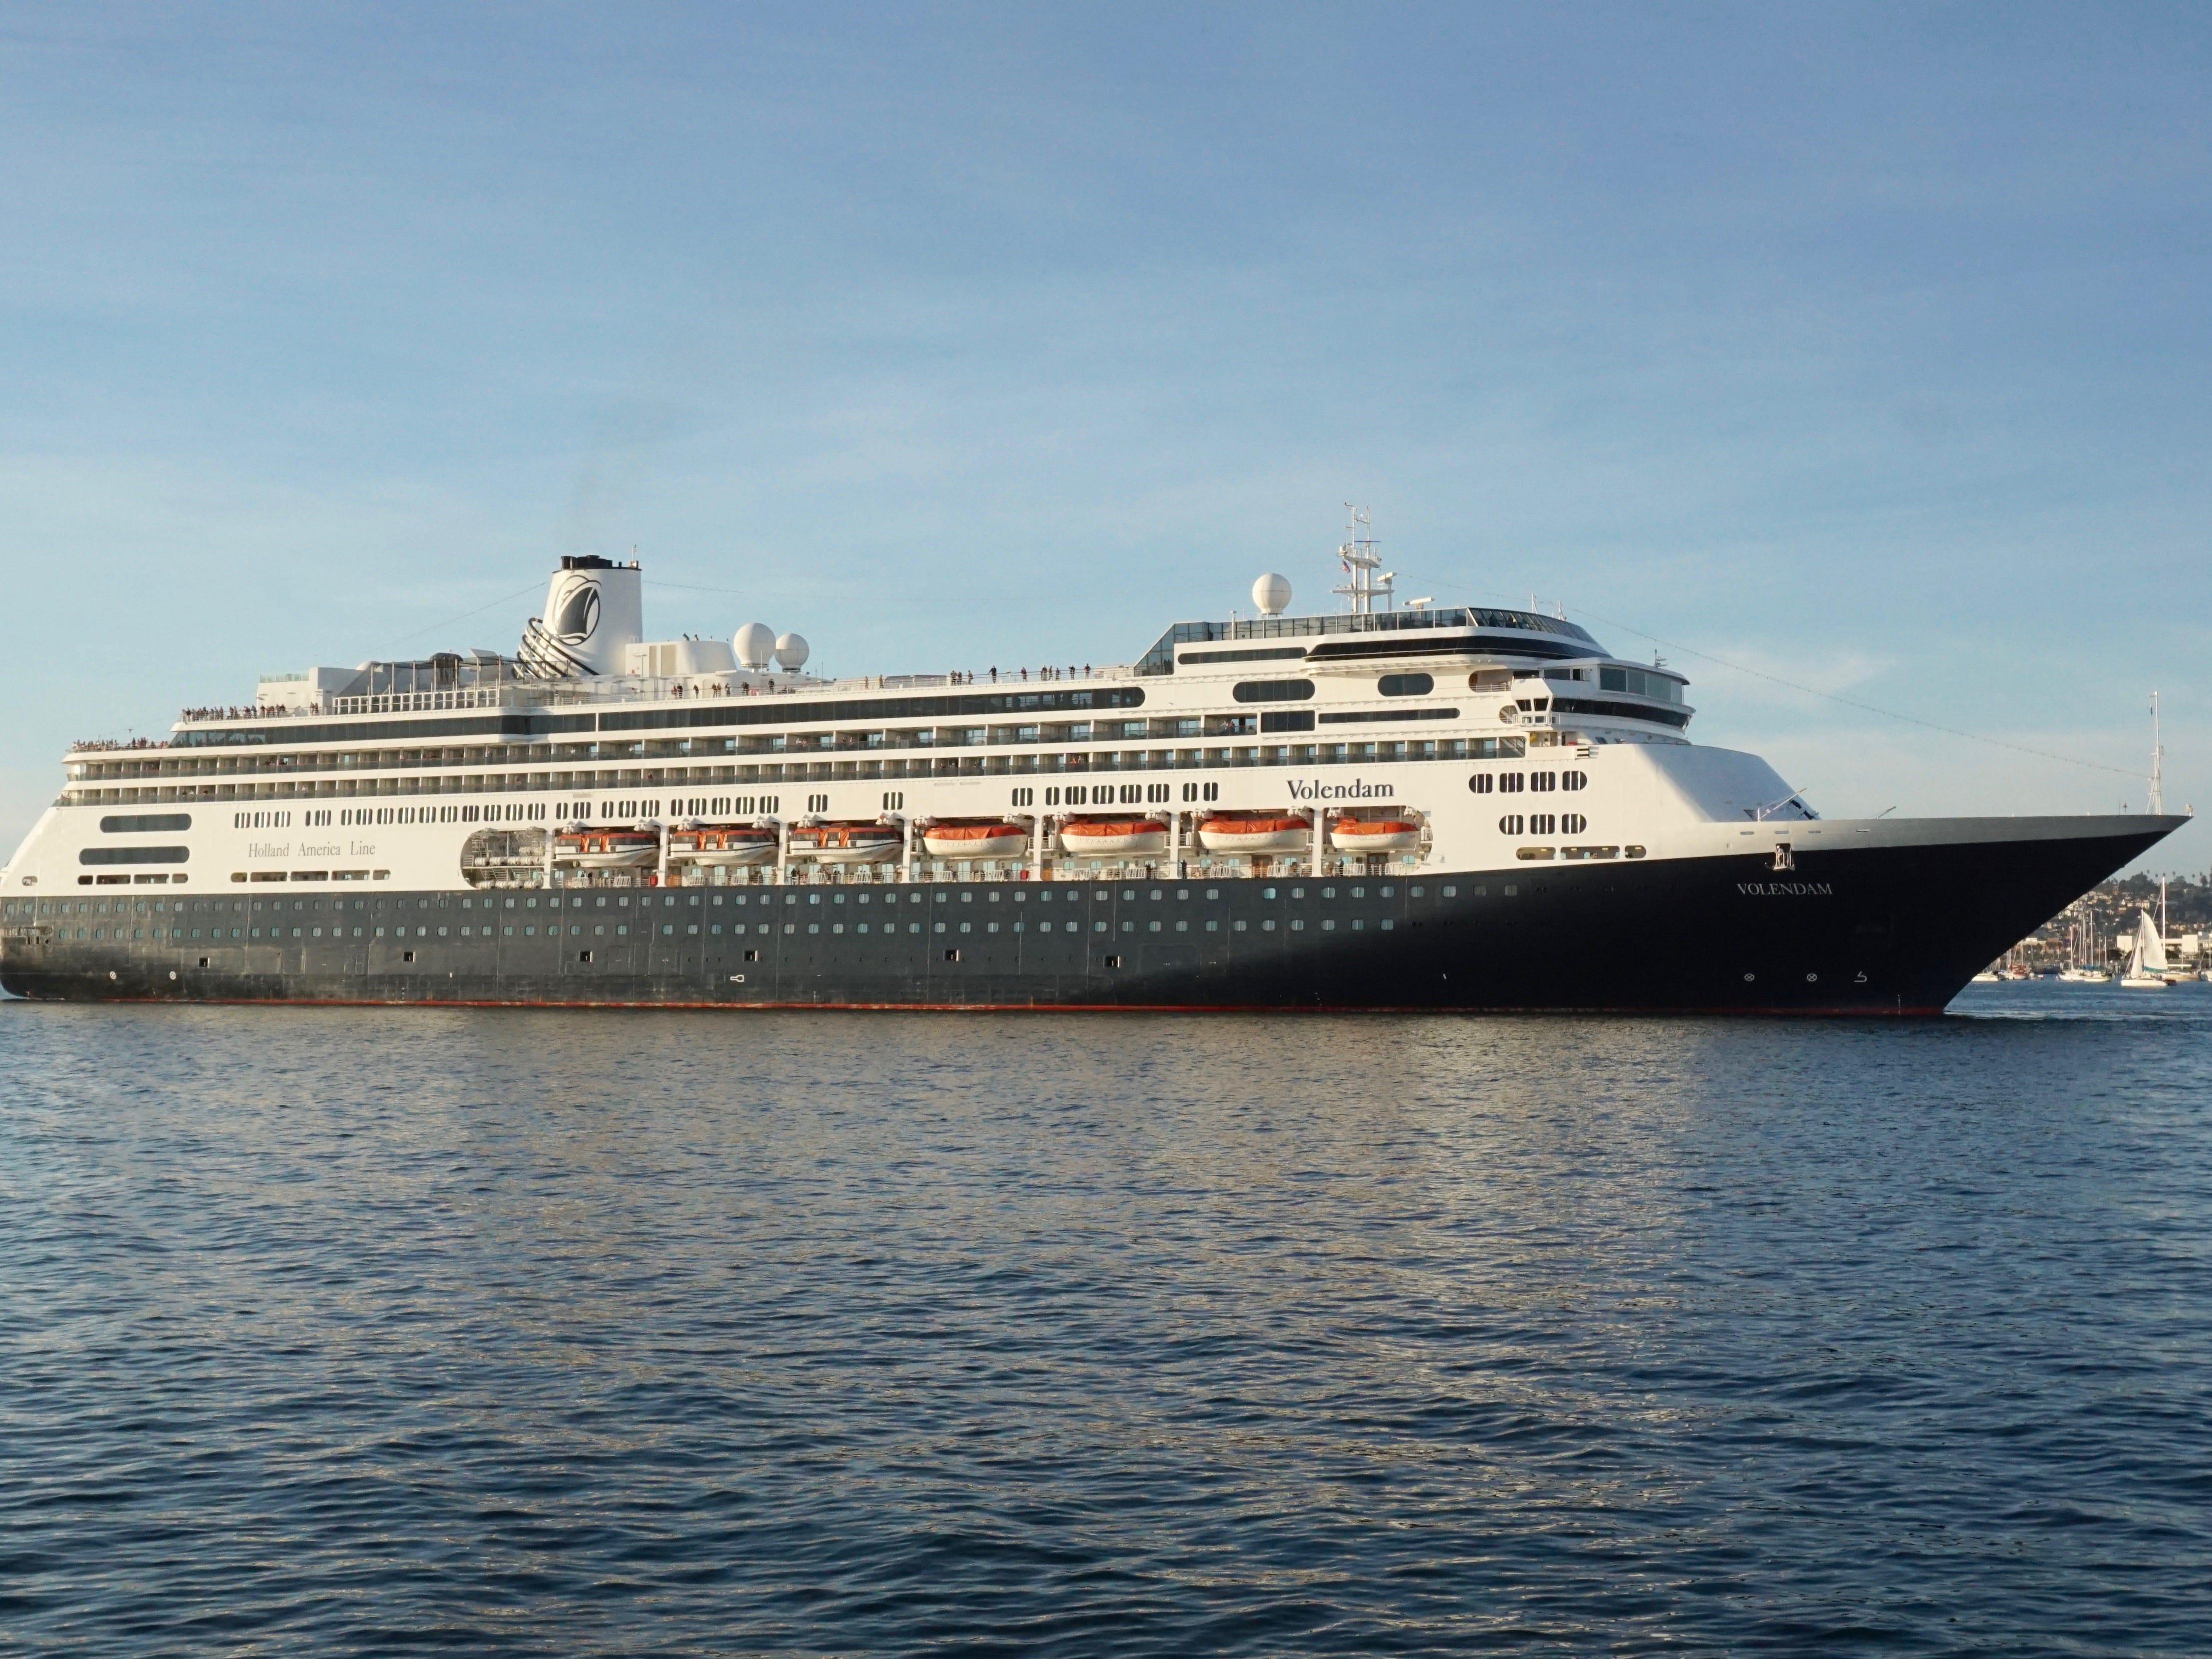 Cruise ship tour: Holland America Line's Volendam